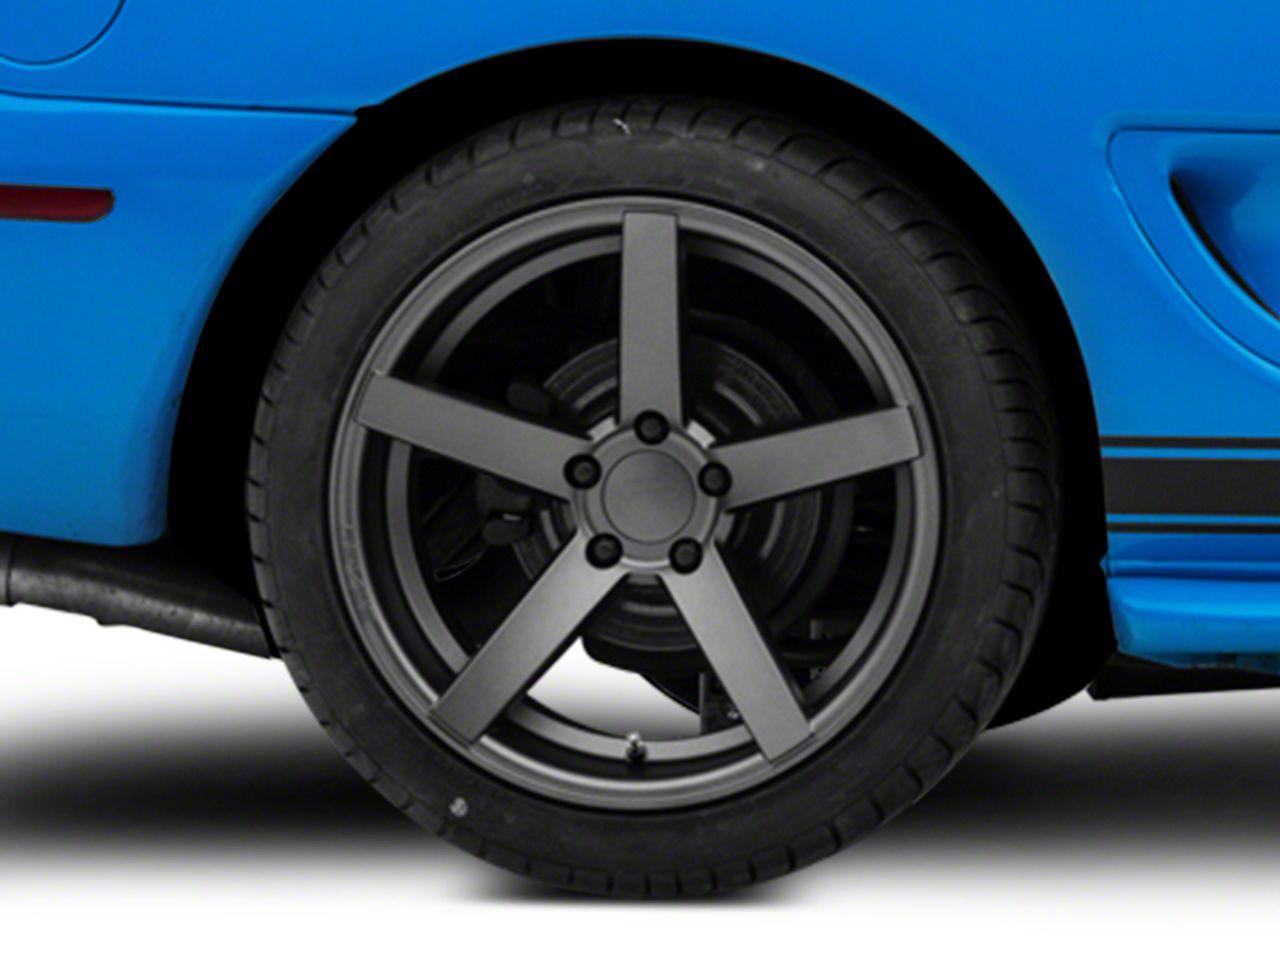 Rovos Durban Gunmetal Wheel - 18x10.5 - Rear Only (94-04 All)